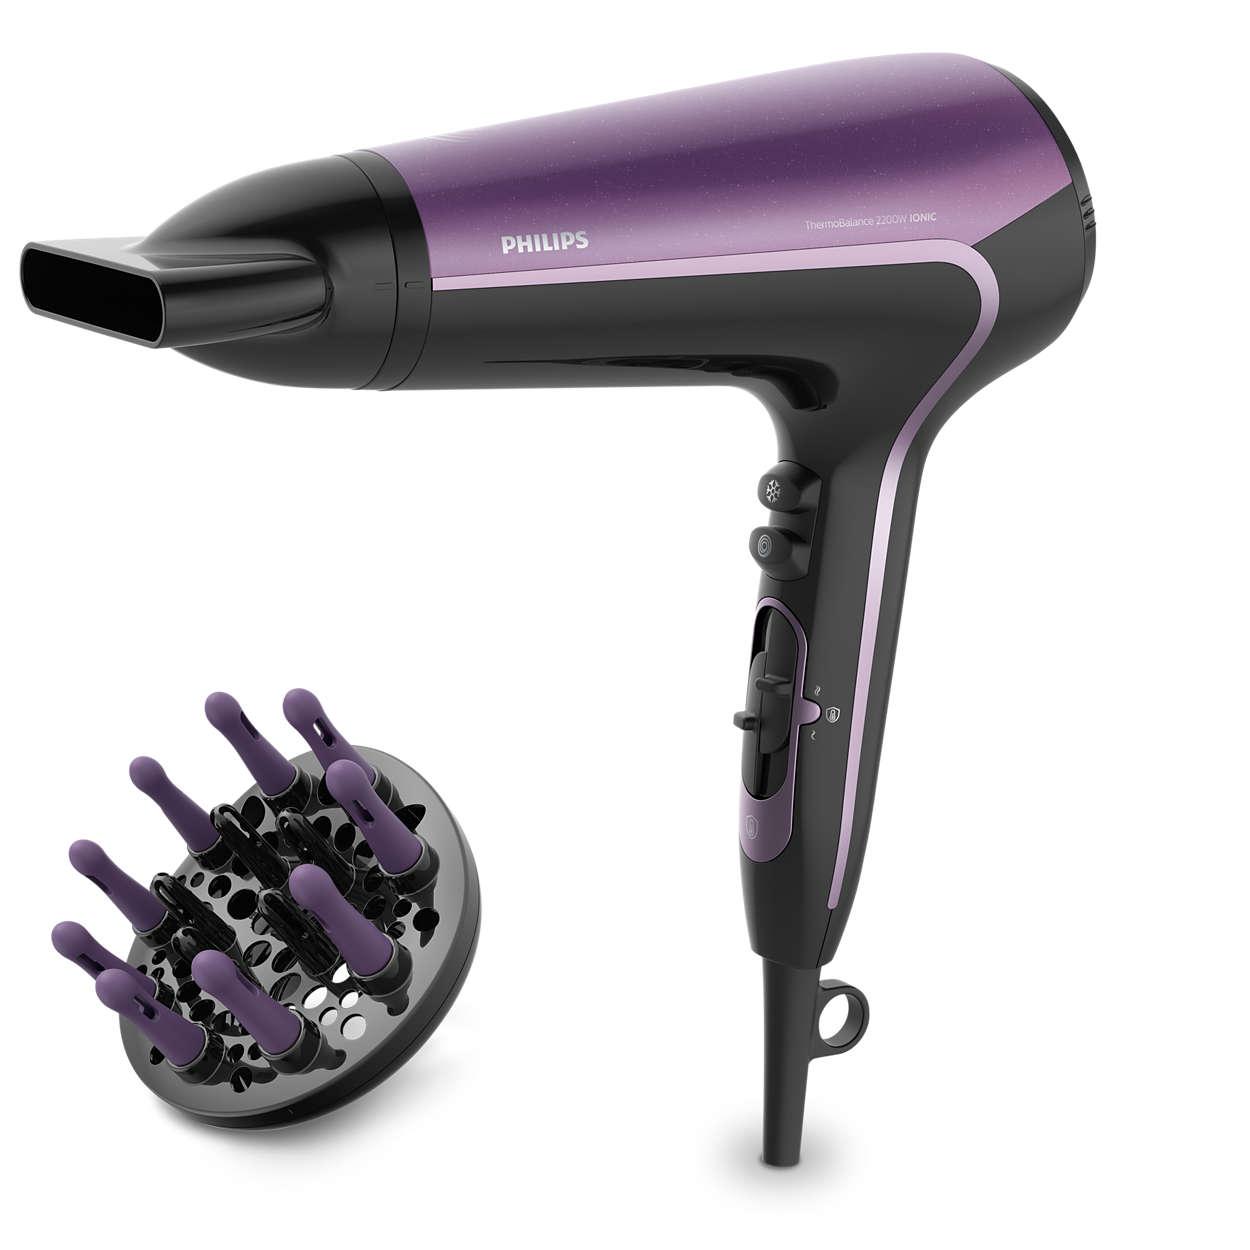 Protection active anti-surchauffe: cheveux 22% plus brillants*.